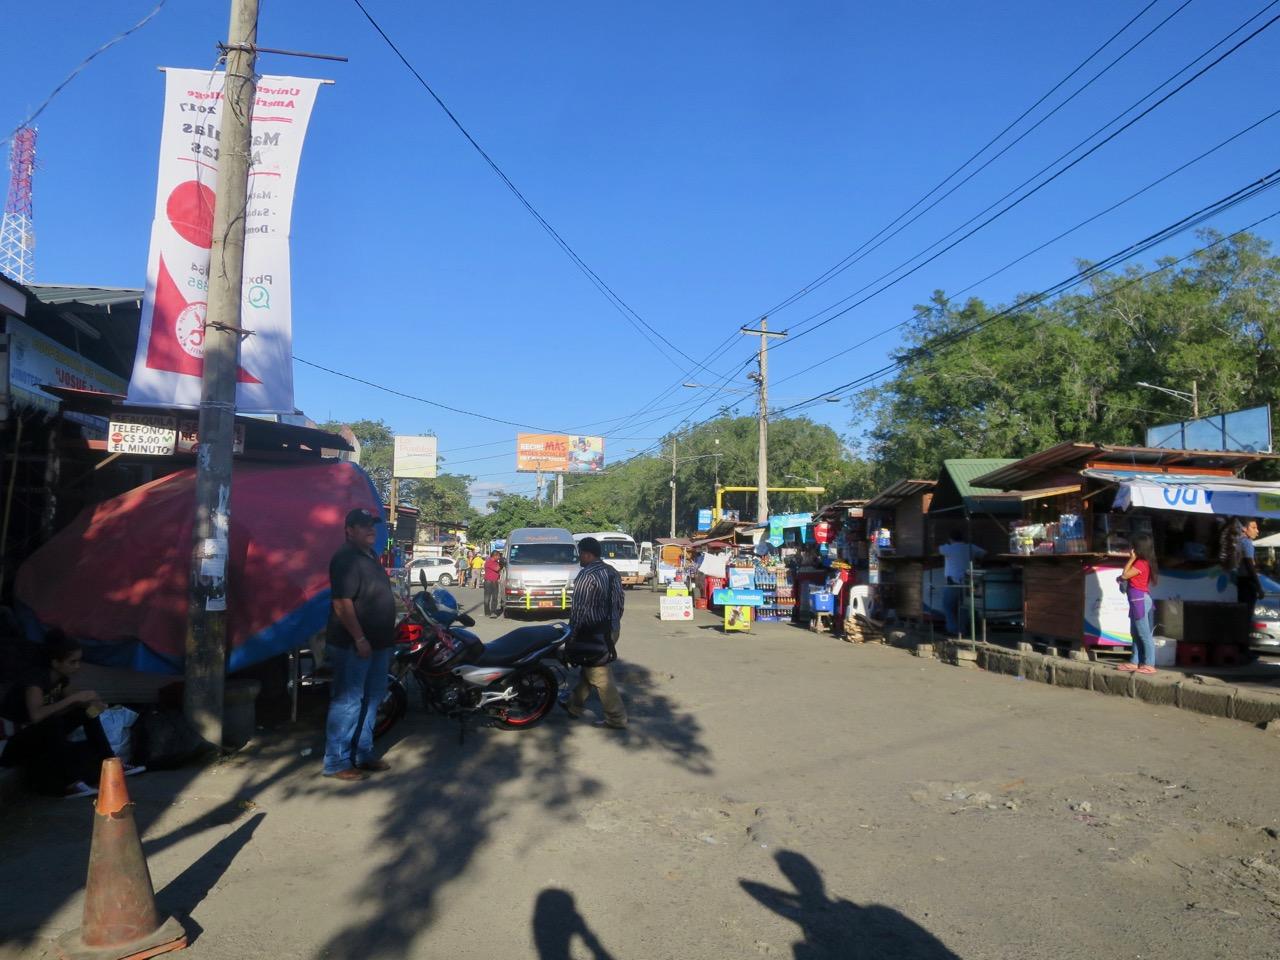 León Nicaragua 1 25